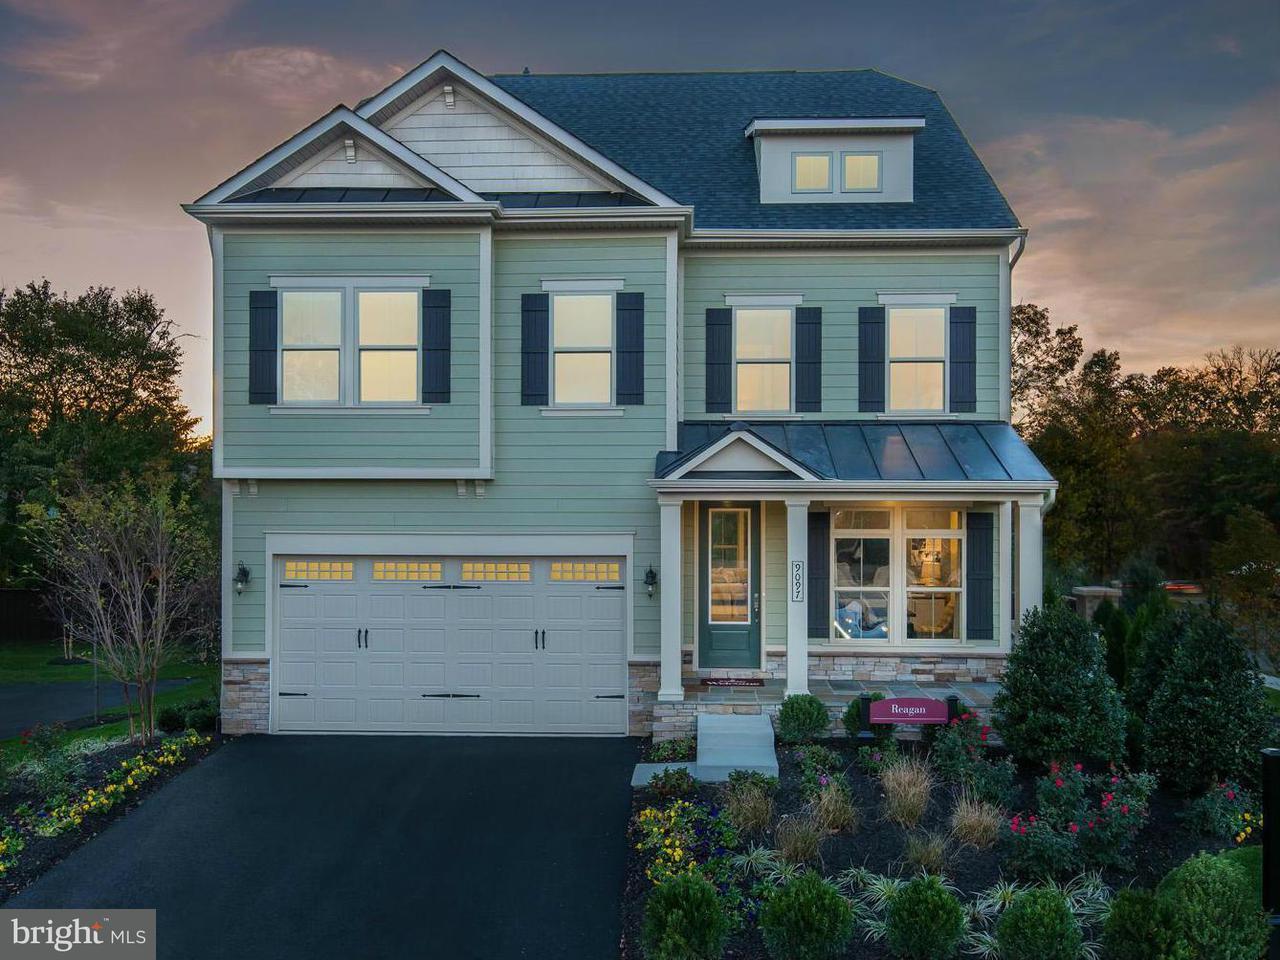 Single Family Home for Sale at Cranebill Cranebill Fairfax, Virginia 22030 United States